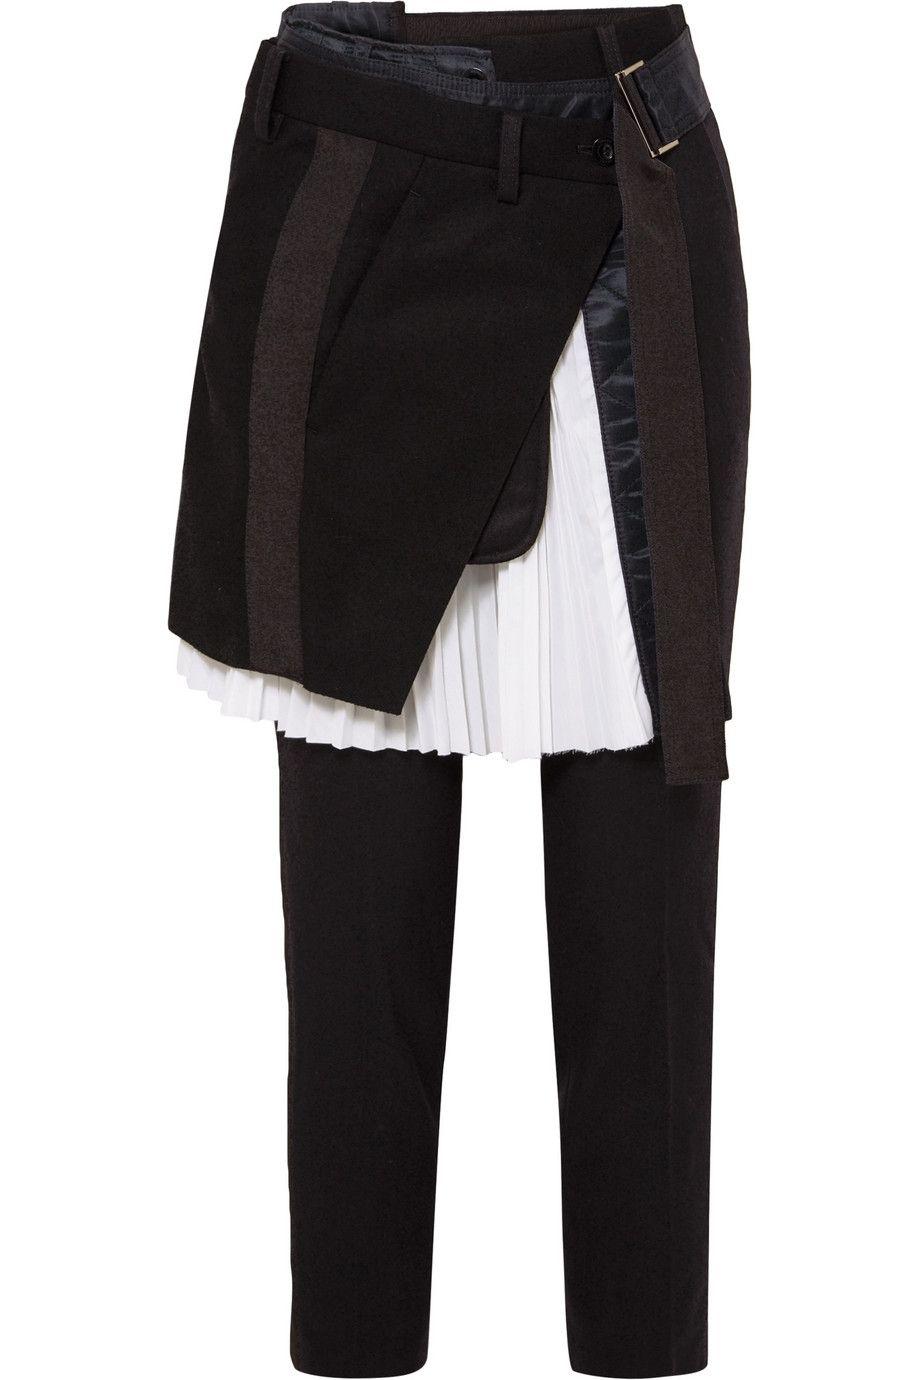 #PopbelaOOTD: Say Hello to Celana Kantor Keren